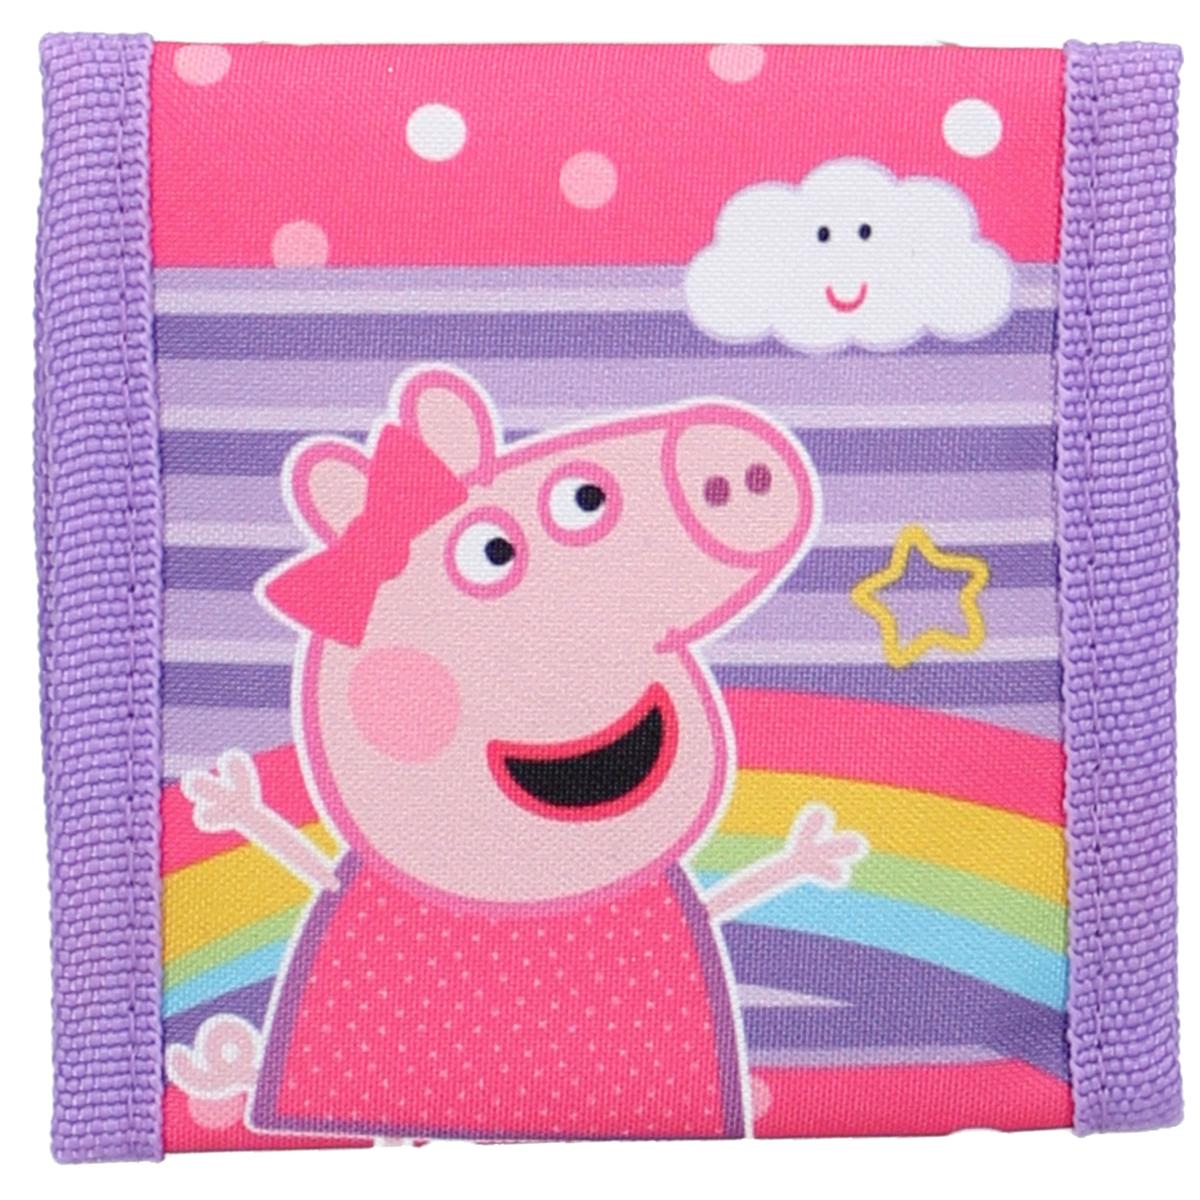 Portefeuille scratch \'Peppa Pig\' violet rose - 10x10 cm - [A3029]